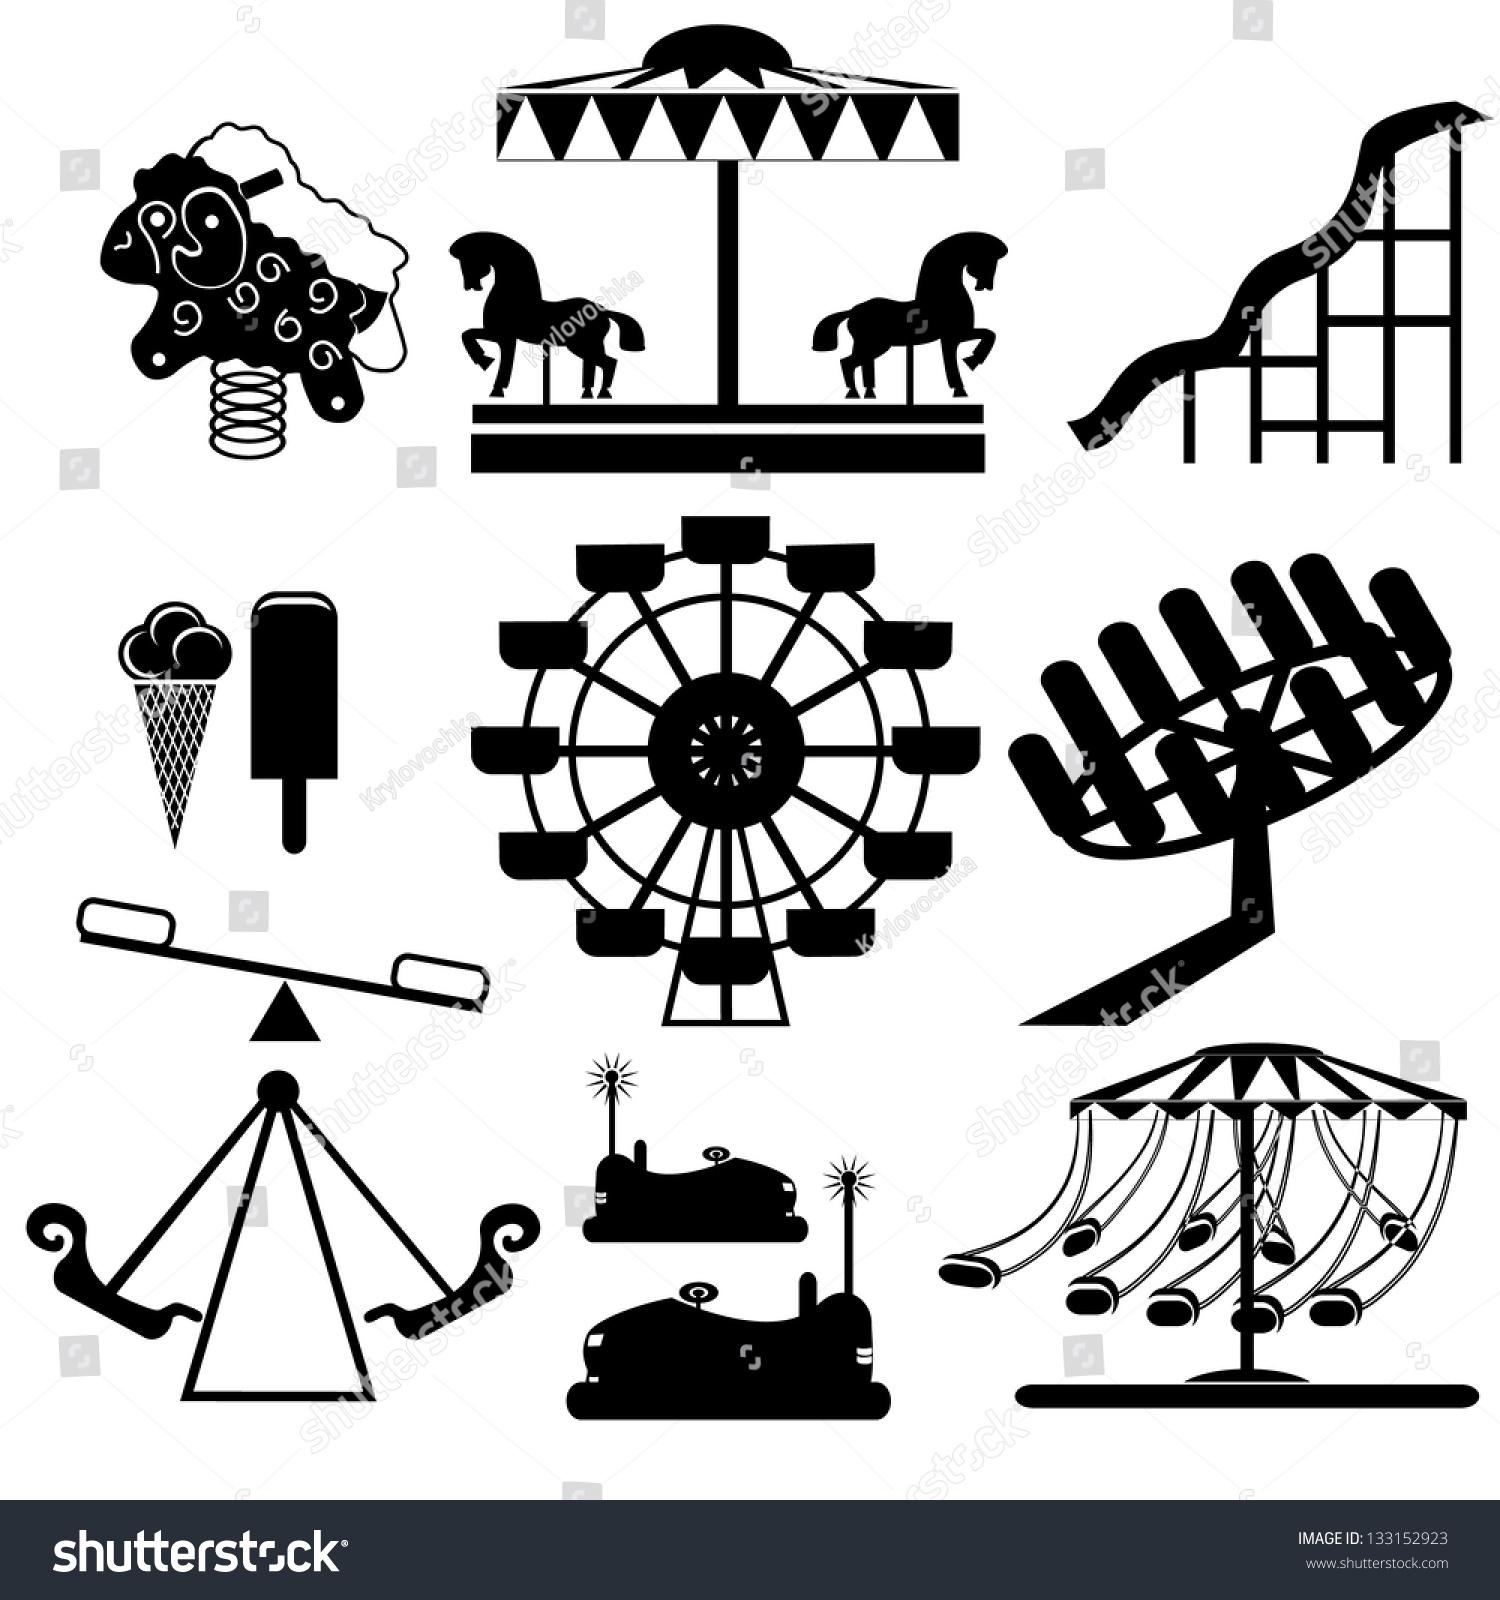 amusement park icons stock vector 133152923 shutterstock Fancy Carousel Horse Clip Art Carousel Horse Stencils